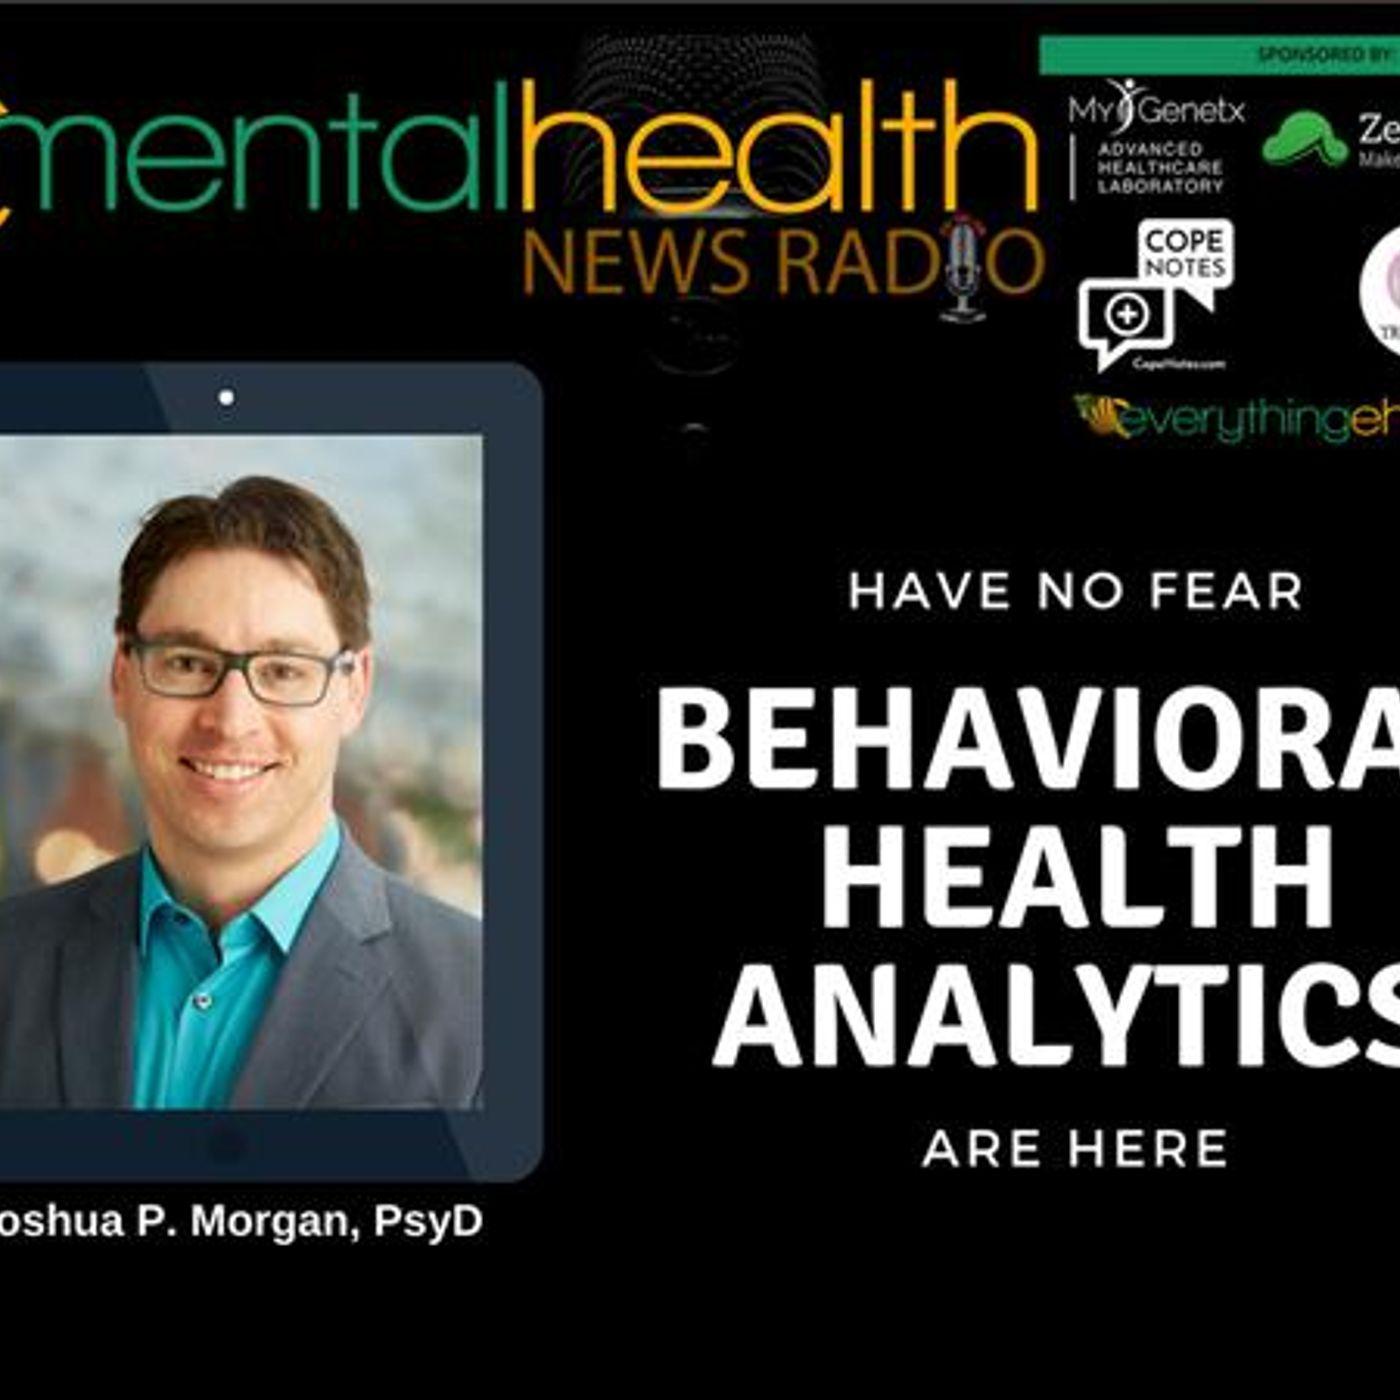 Mental Health News Radio - Have No Fear: Behavioral Health Analytics Are Here With Joshua P. Morgan, PsyD